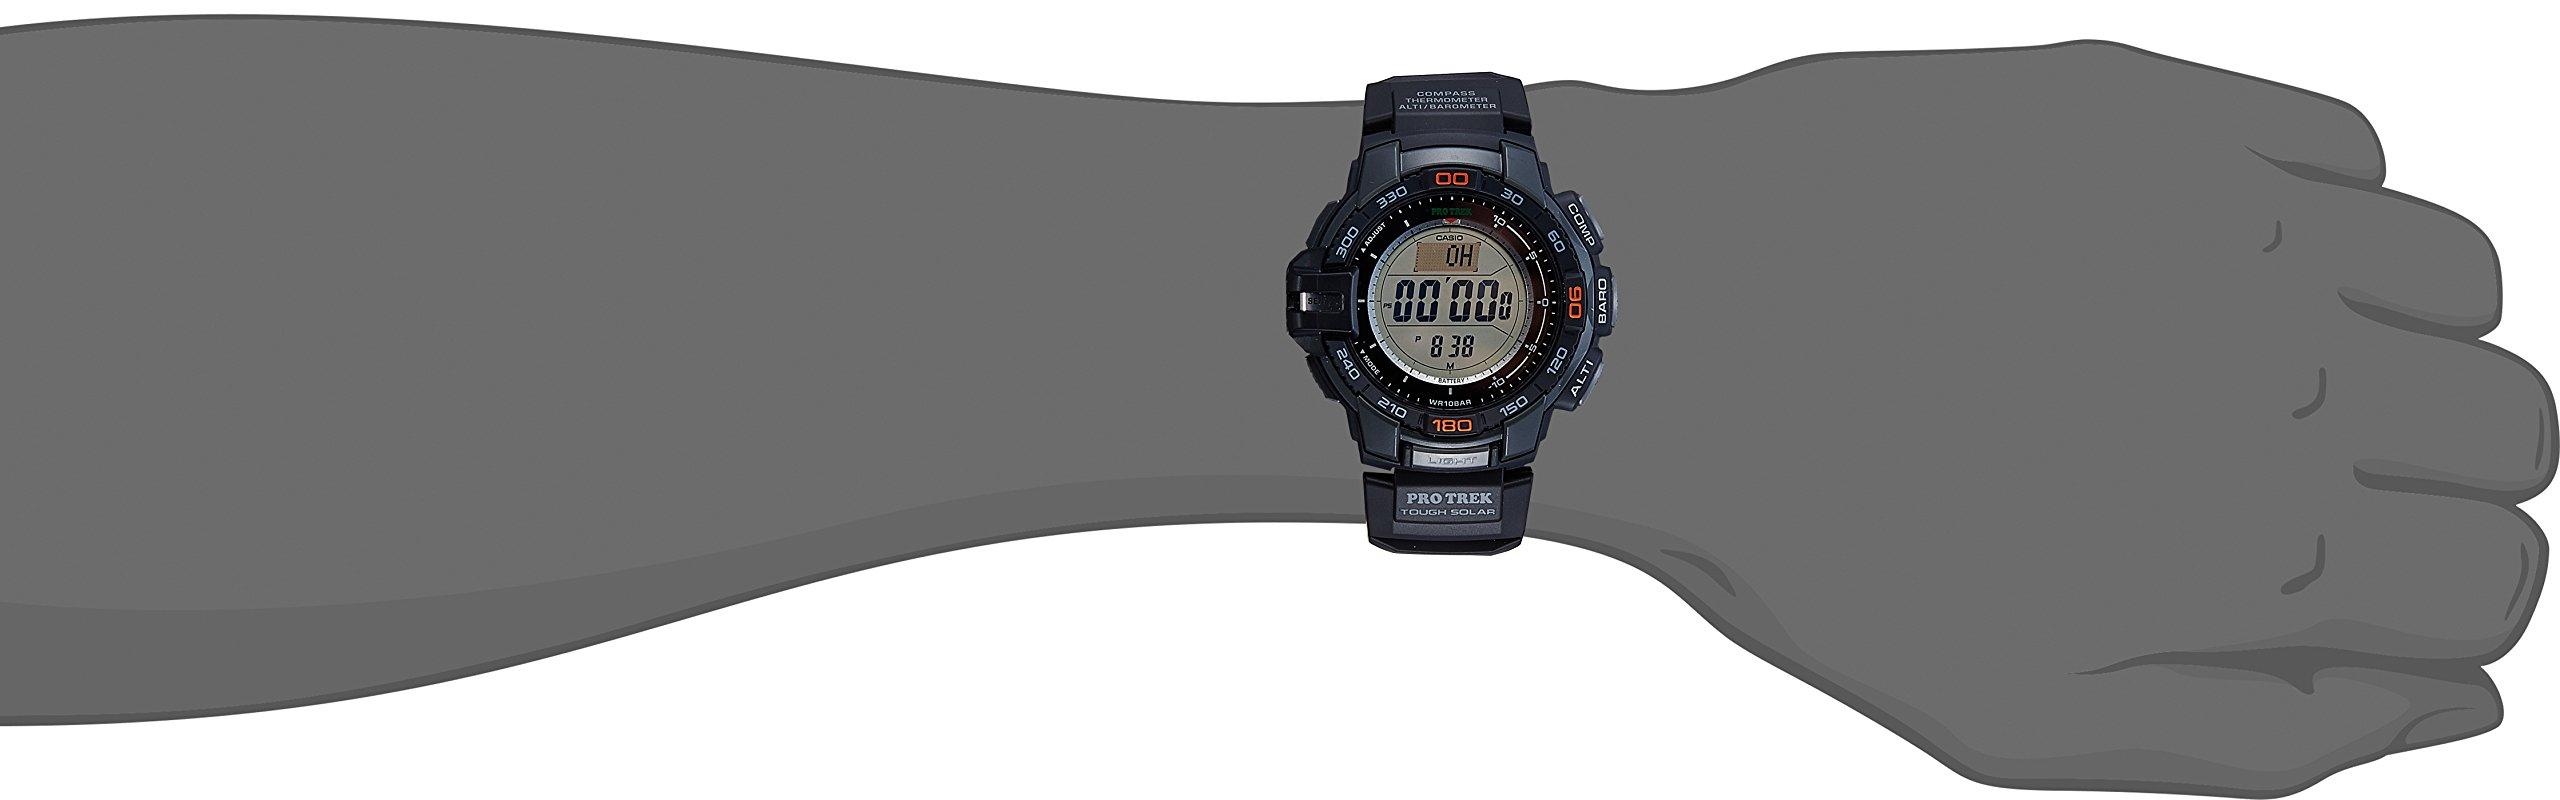 Casio Men's Pro Trek PRG-270-1 Tough Solar Triple Sensor Multifunction Digital Sport Watch by Casio (Image #4)